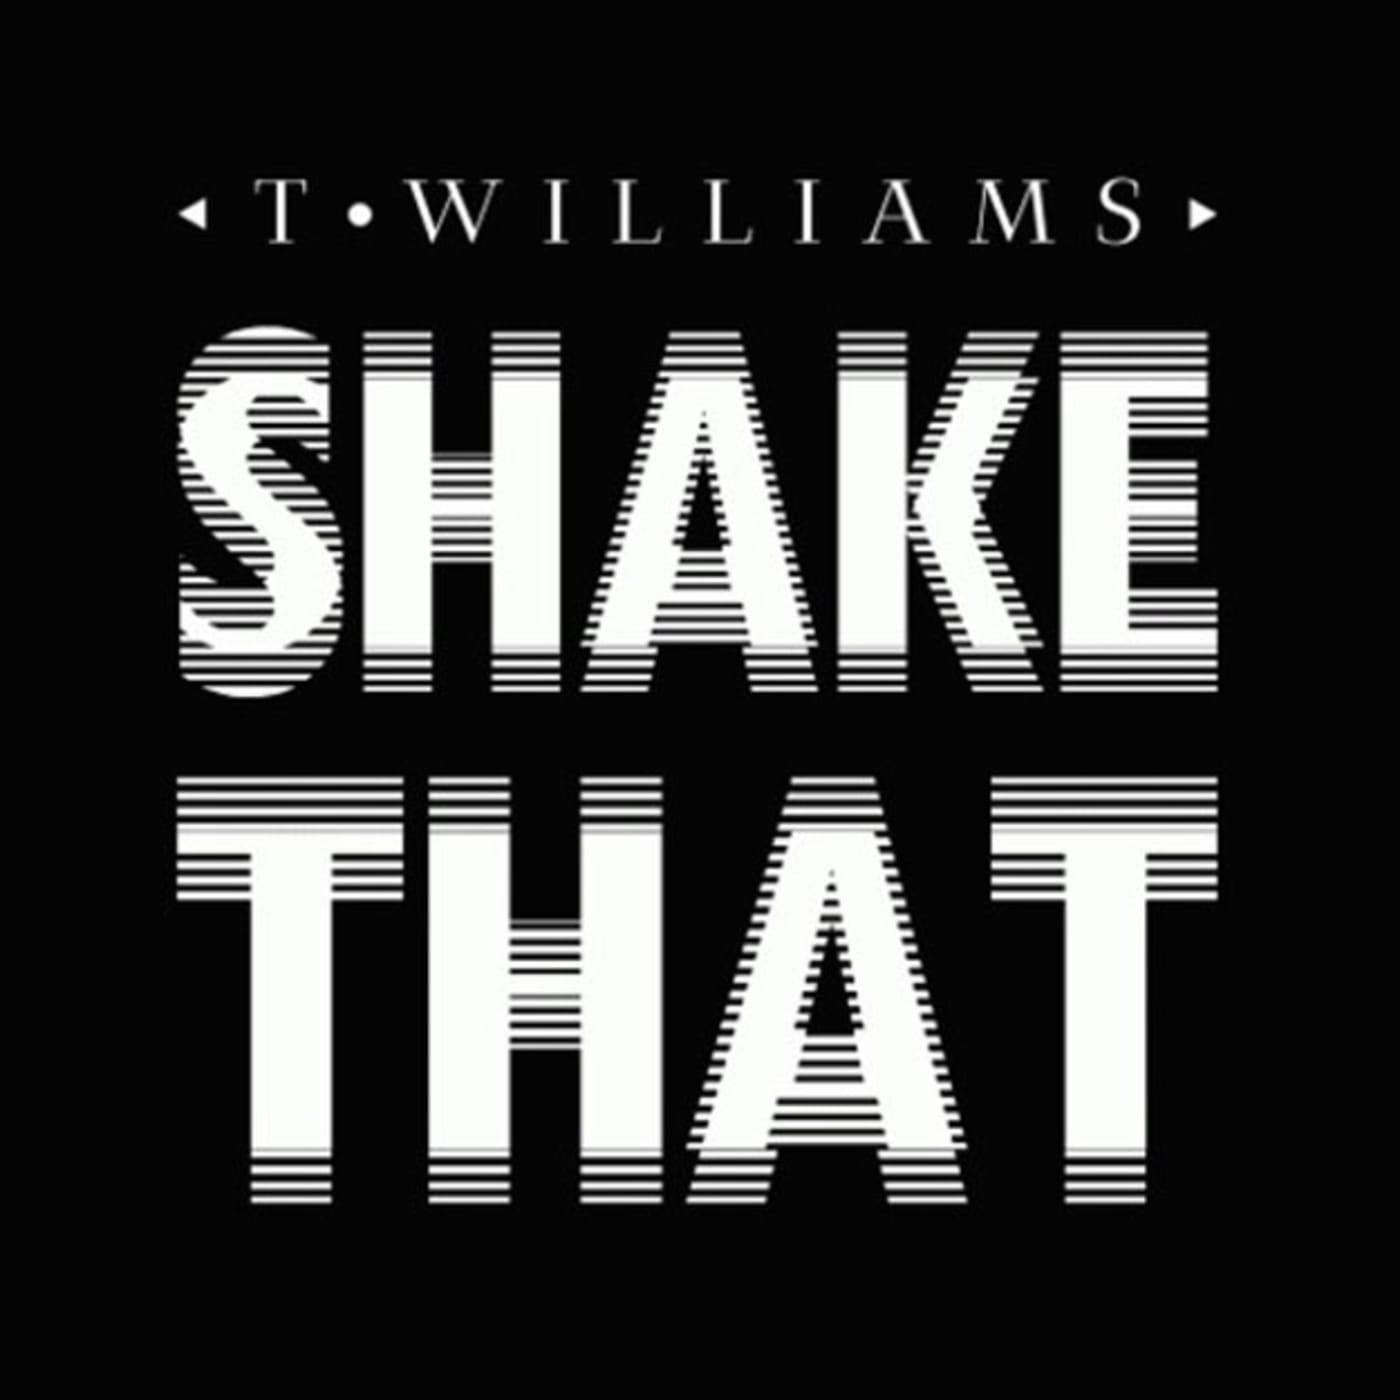 twilliams shake that